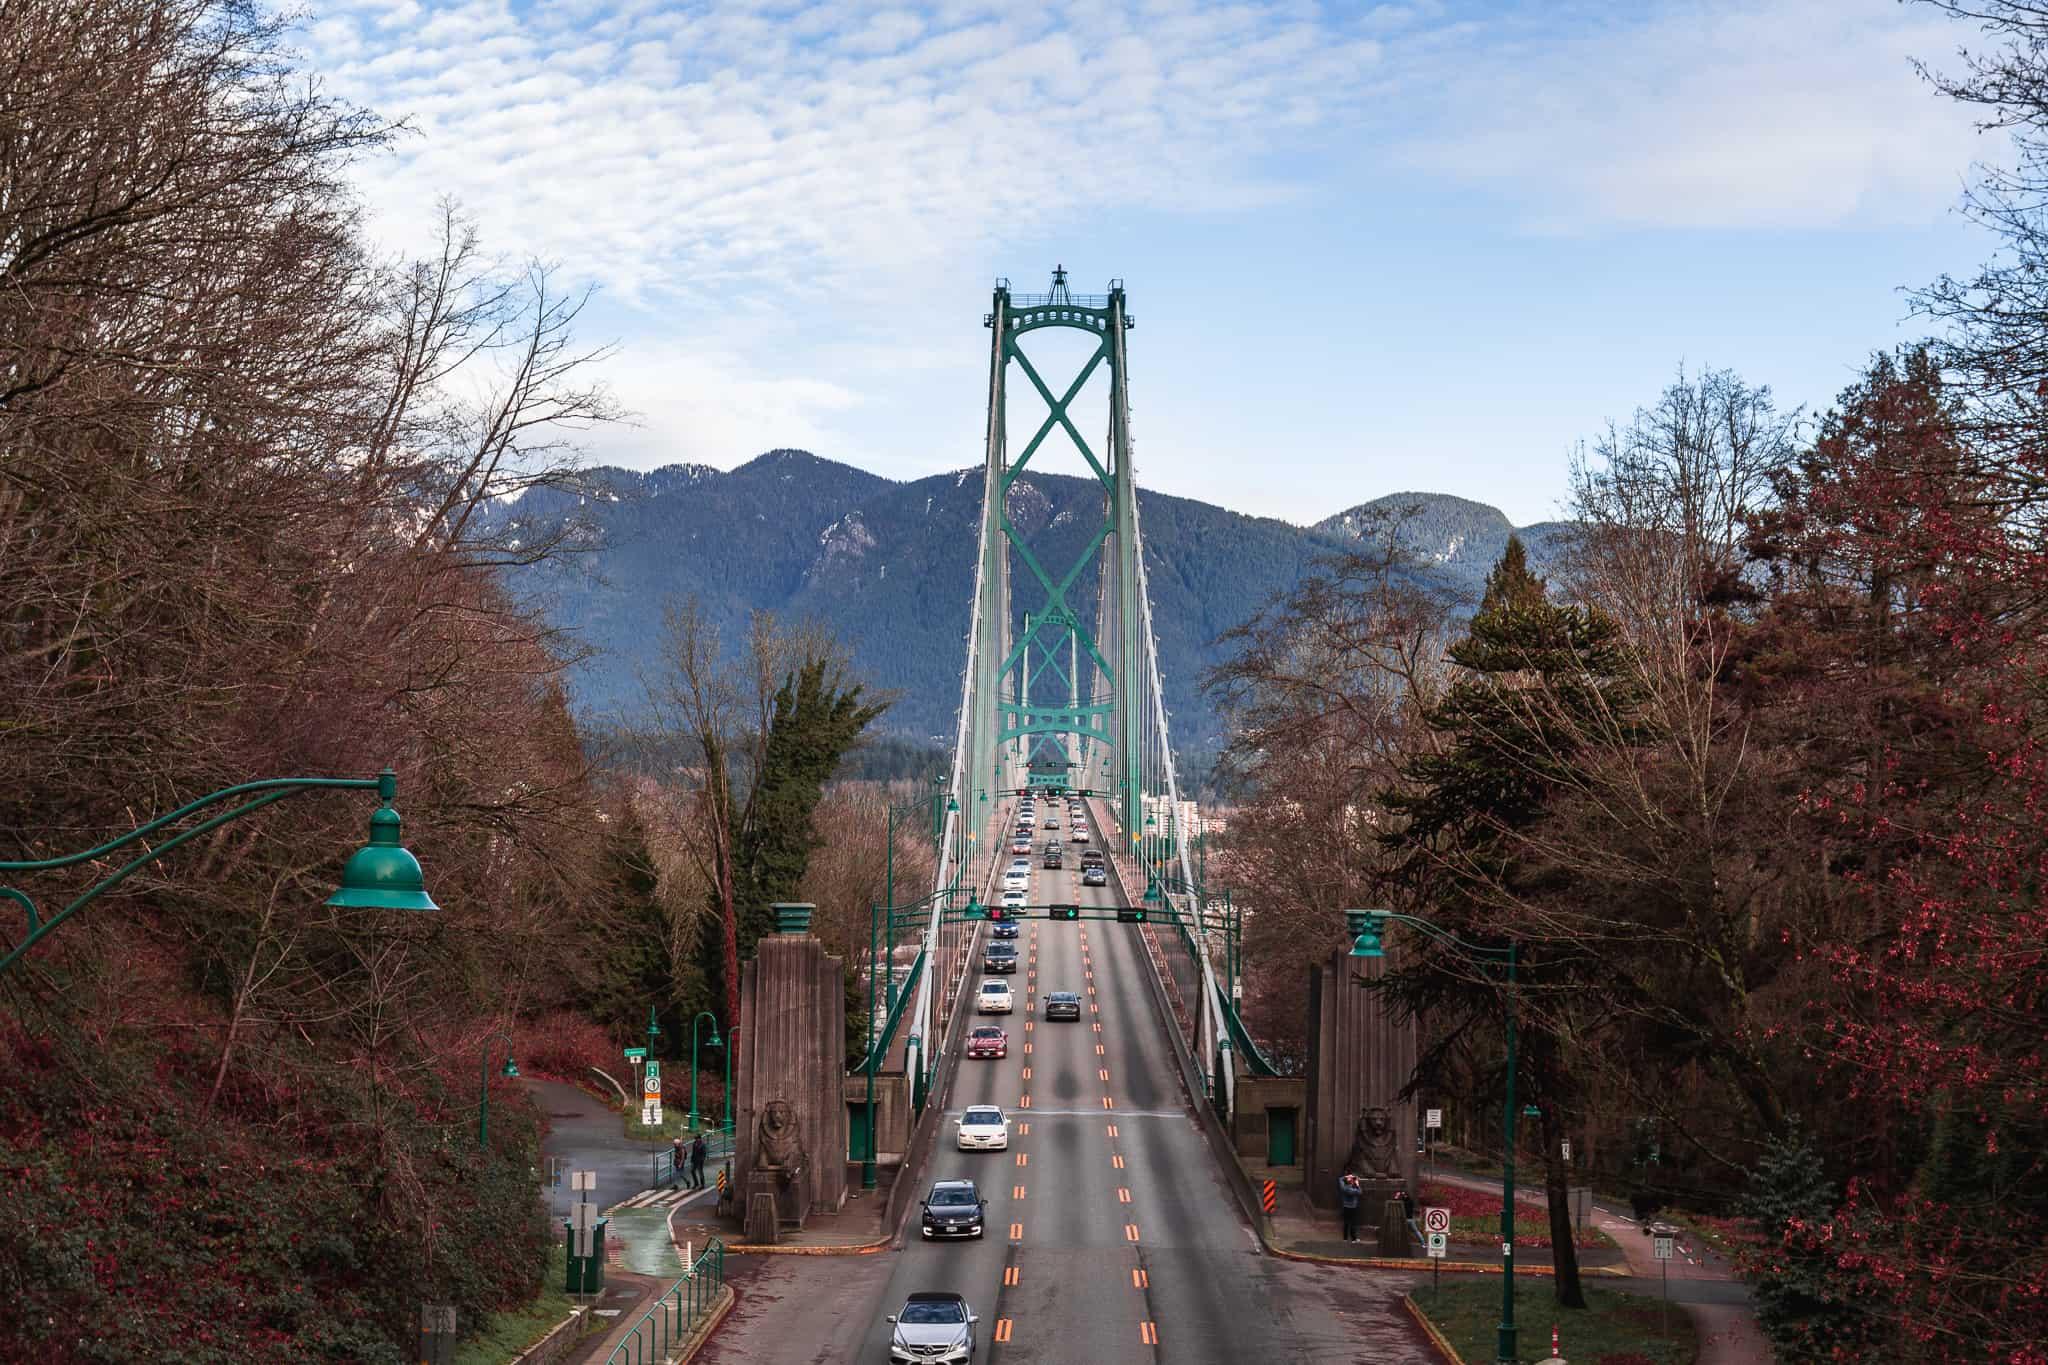 Instagrammable spots Vancouver - Prospect Point